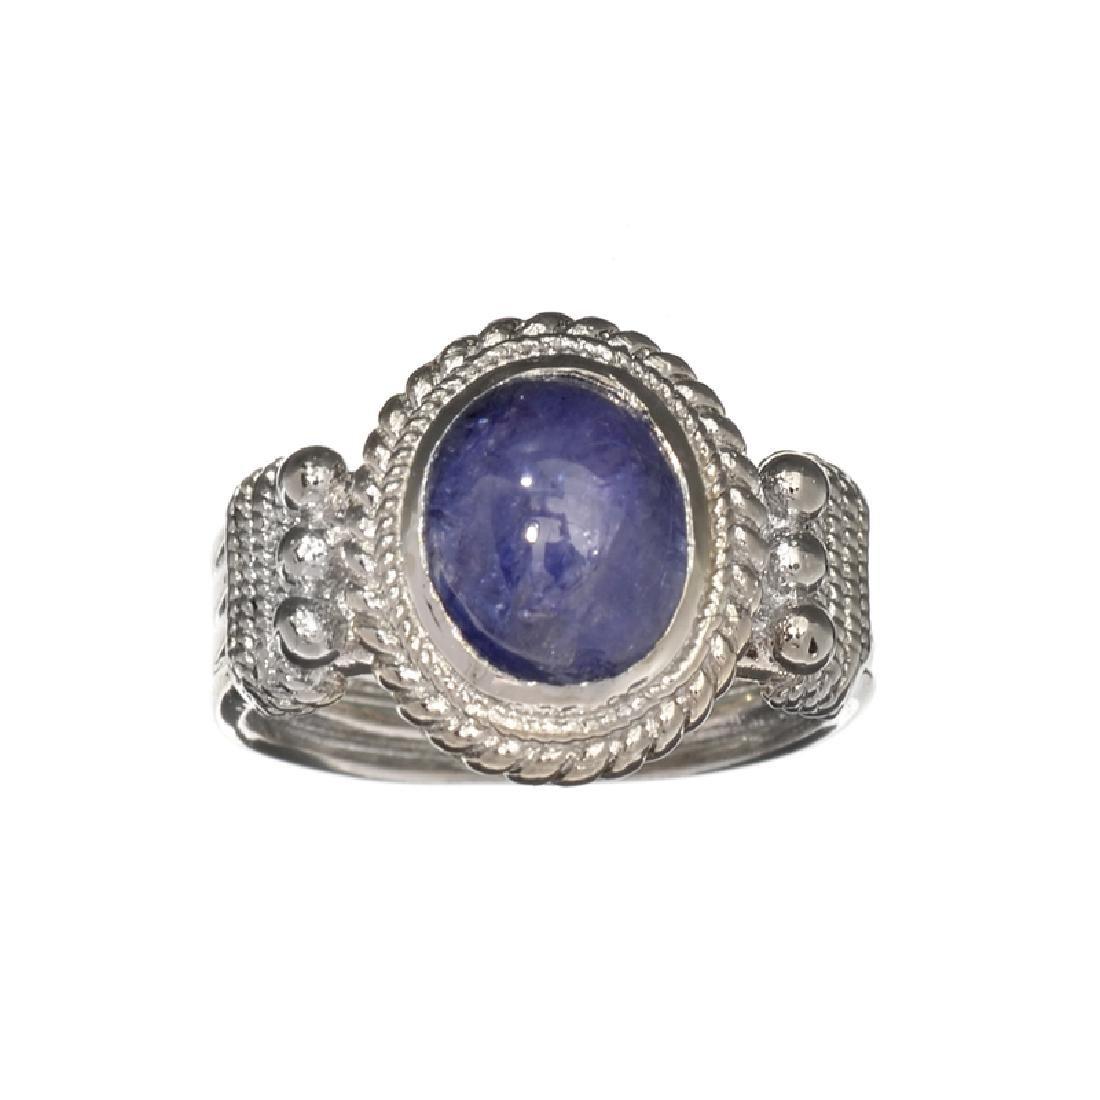 APP: 0.9k Fine Jewelry 3.17CT Oval Cut Tanzanite And